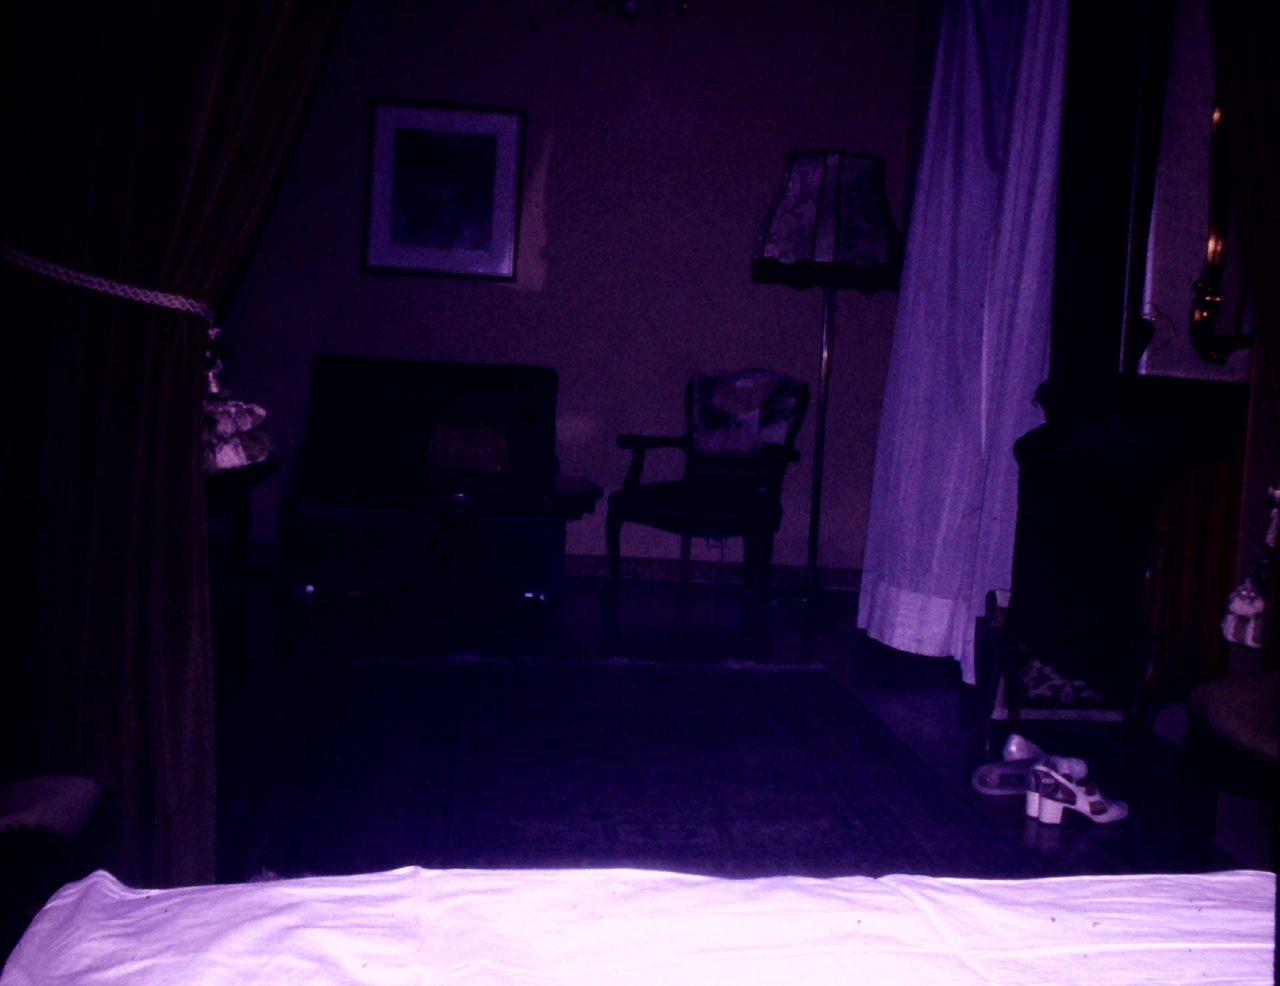 Hotelzimmer in Ungarn, aus Familienbesitz, kasaan media,2019